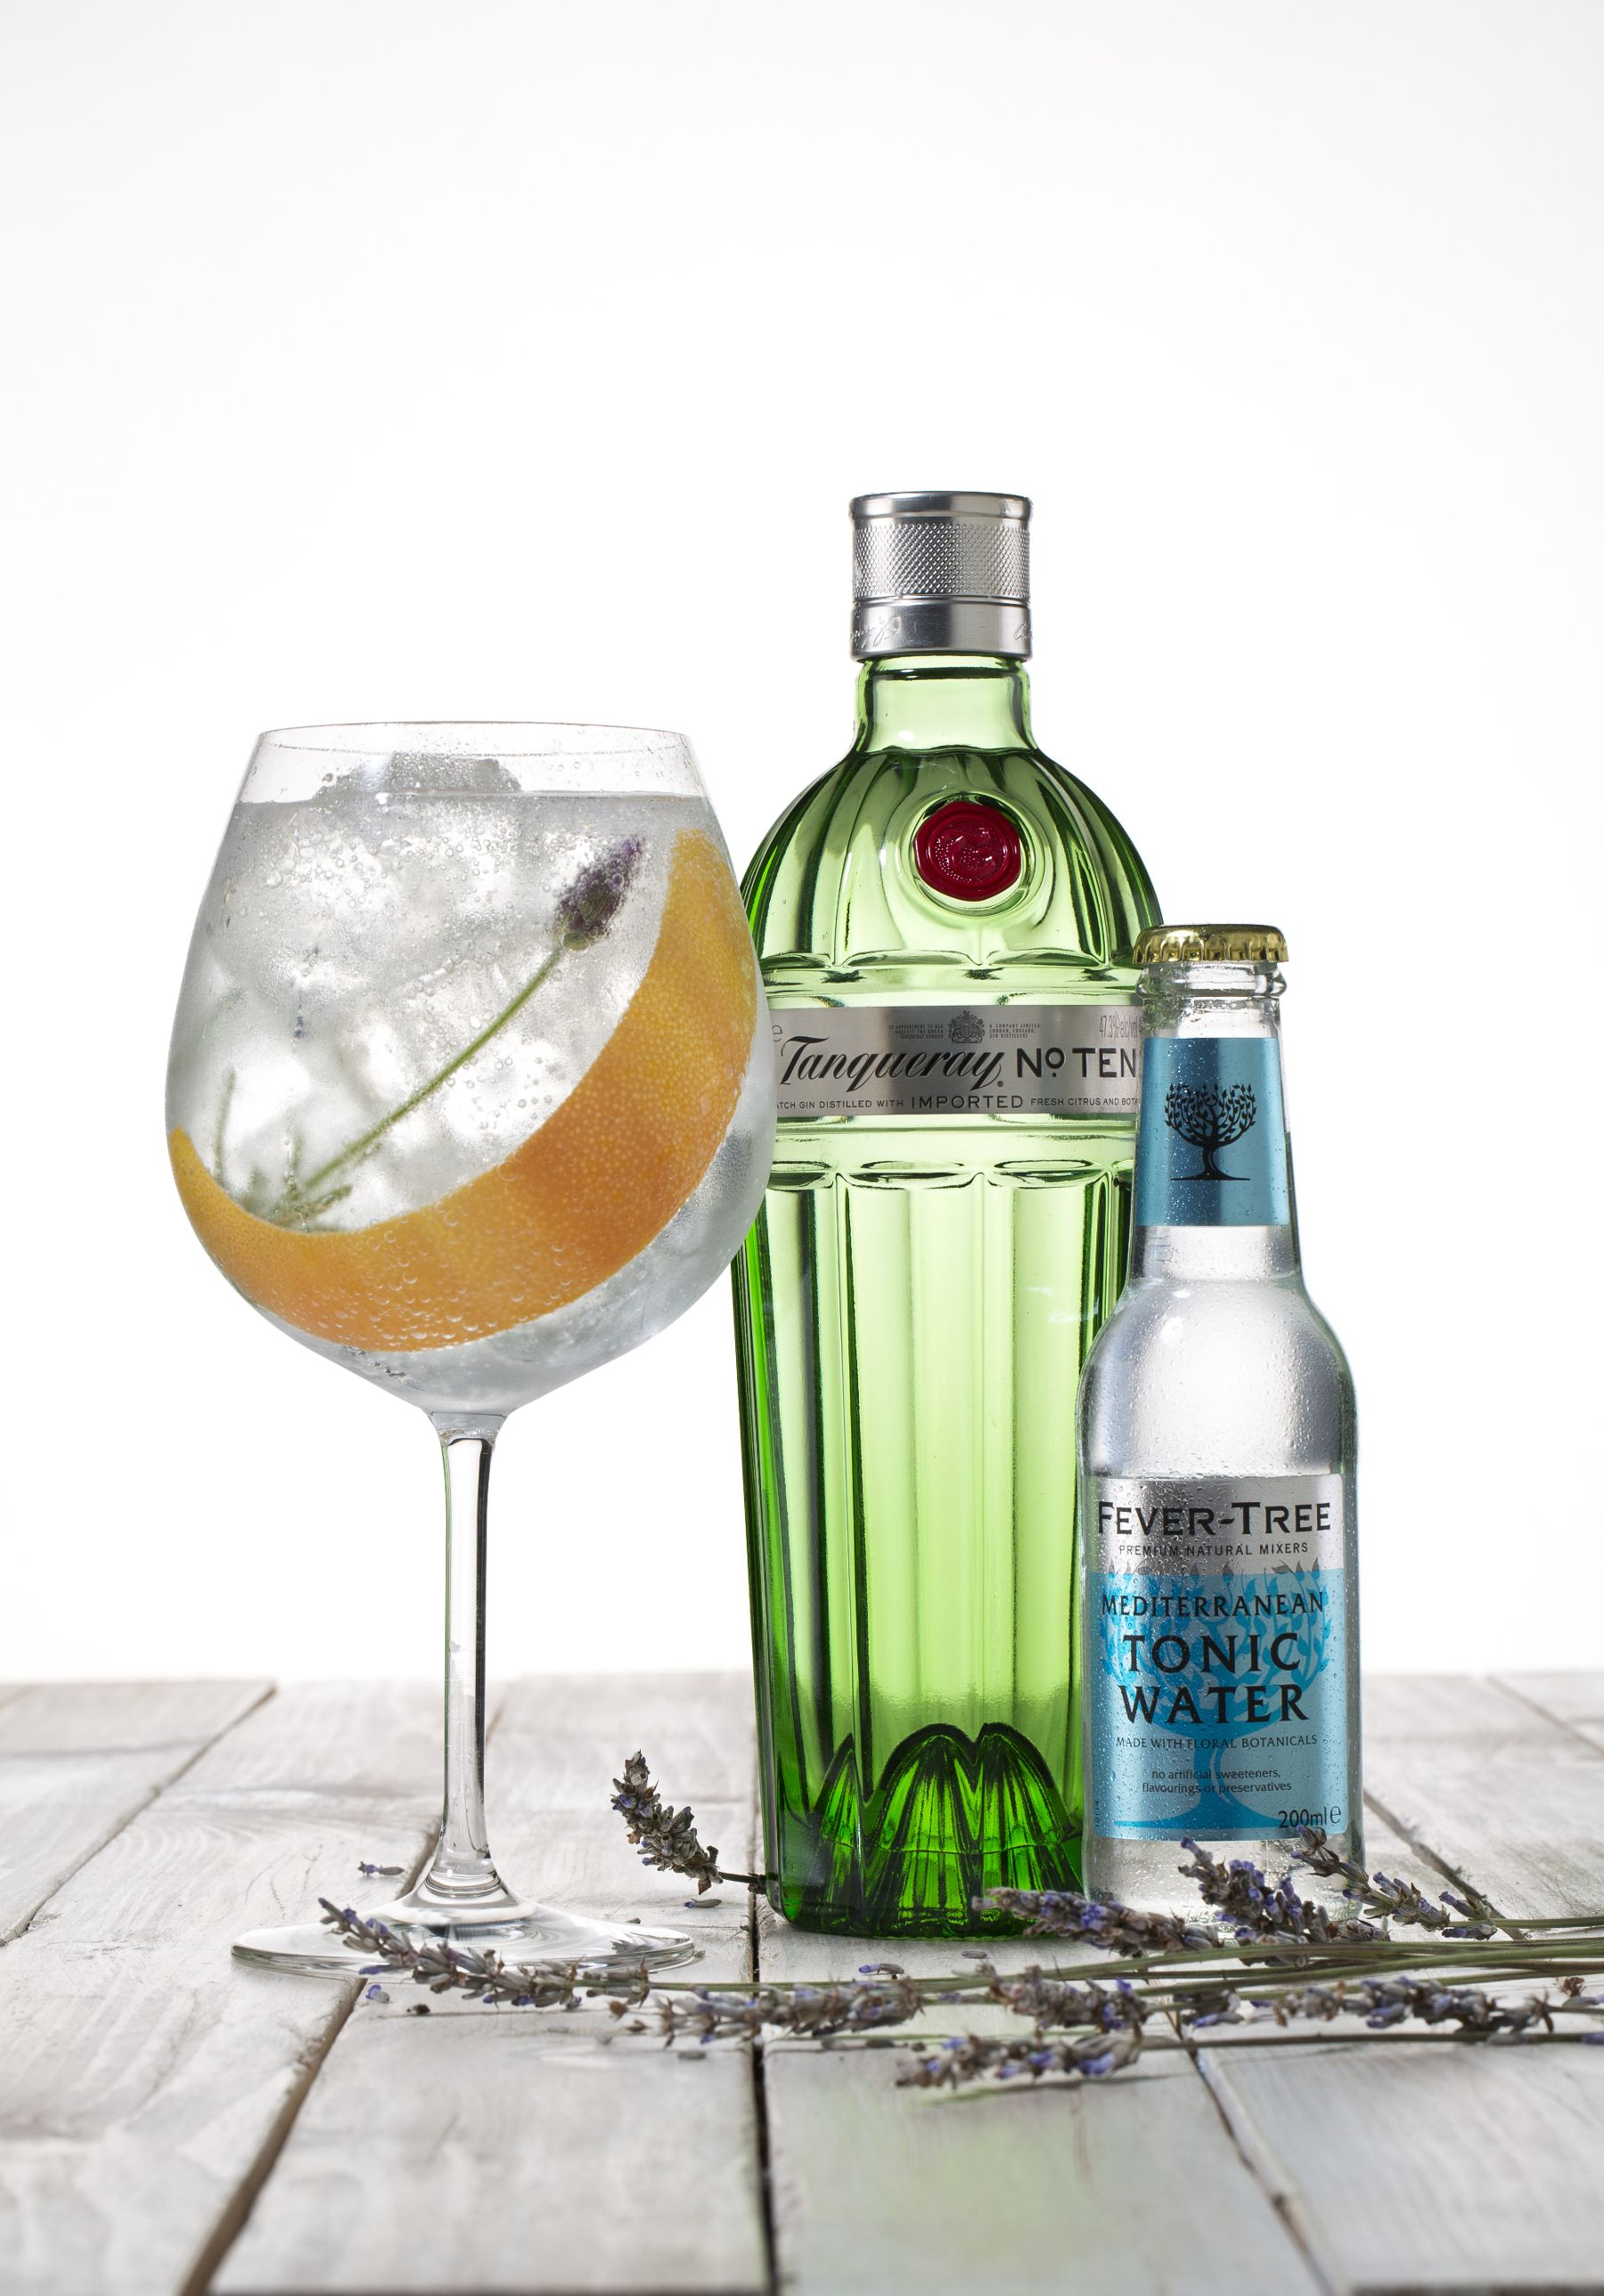 gin tonic afrutado de tanqueray ten y fever tree. Black Bedroom Furniture Sets. Home Design Ideas